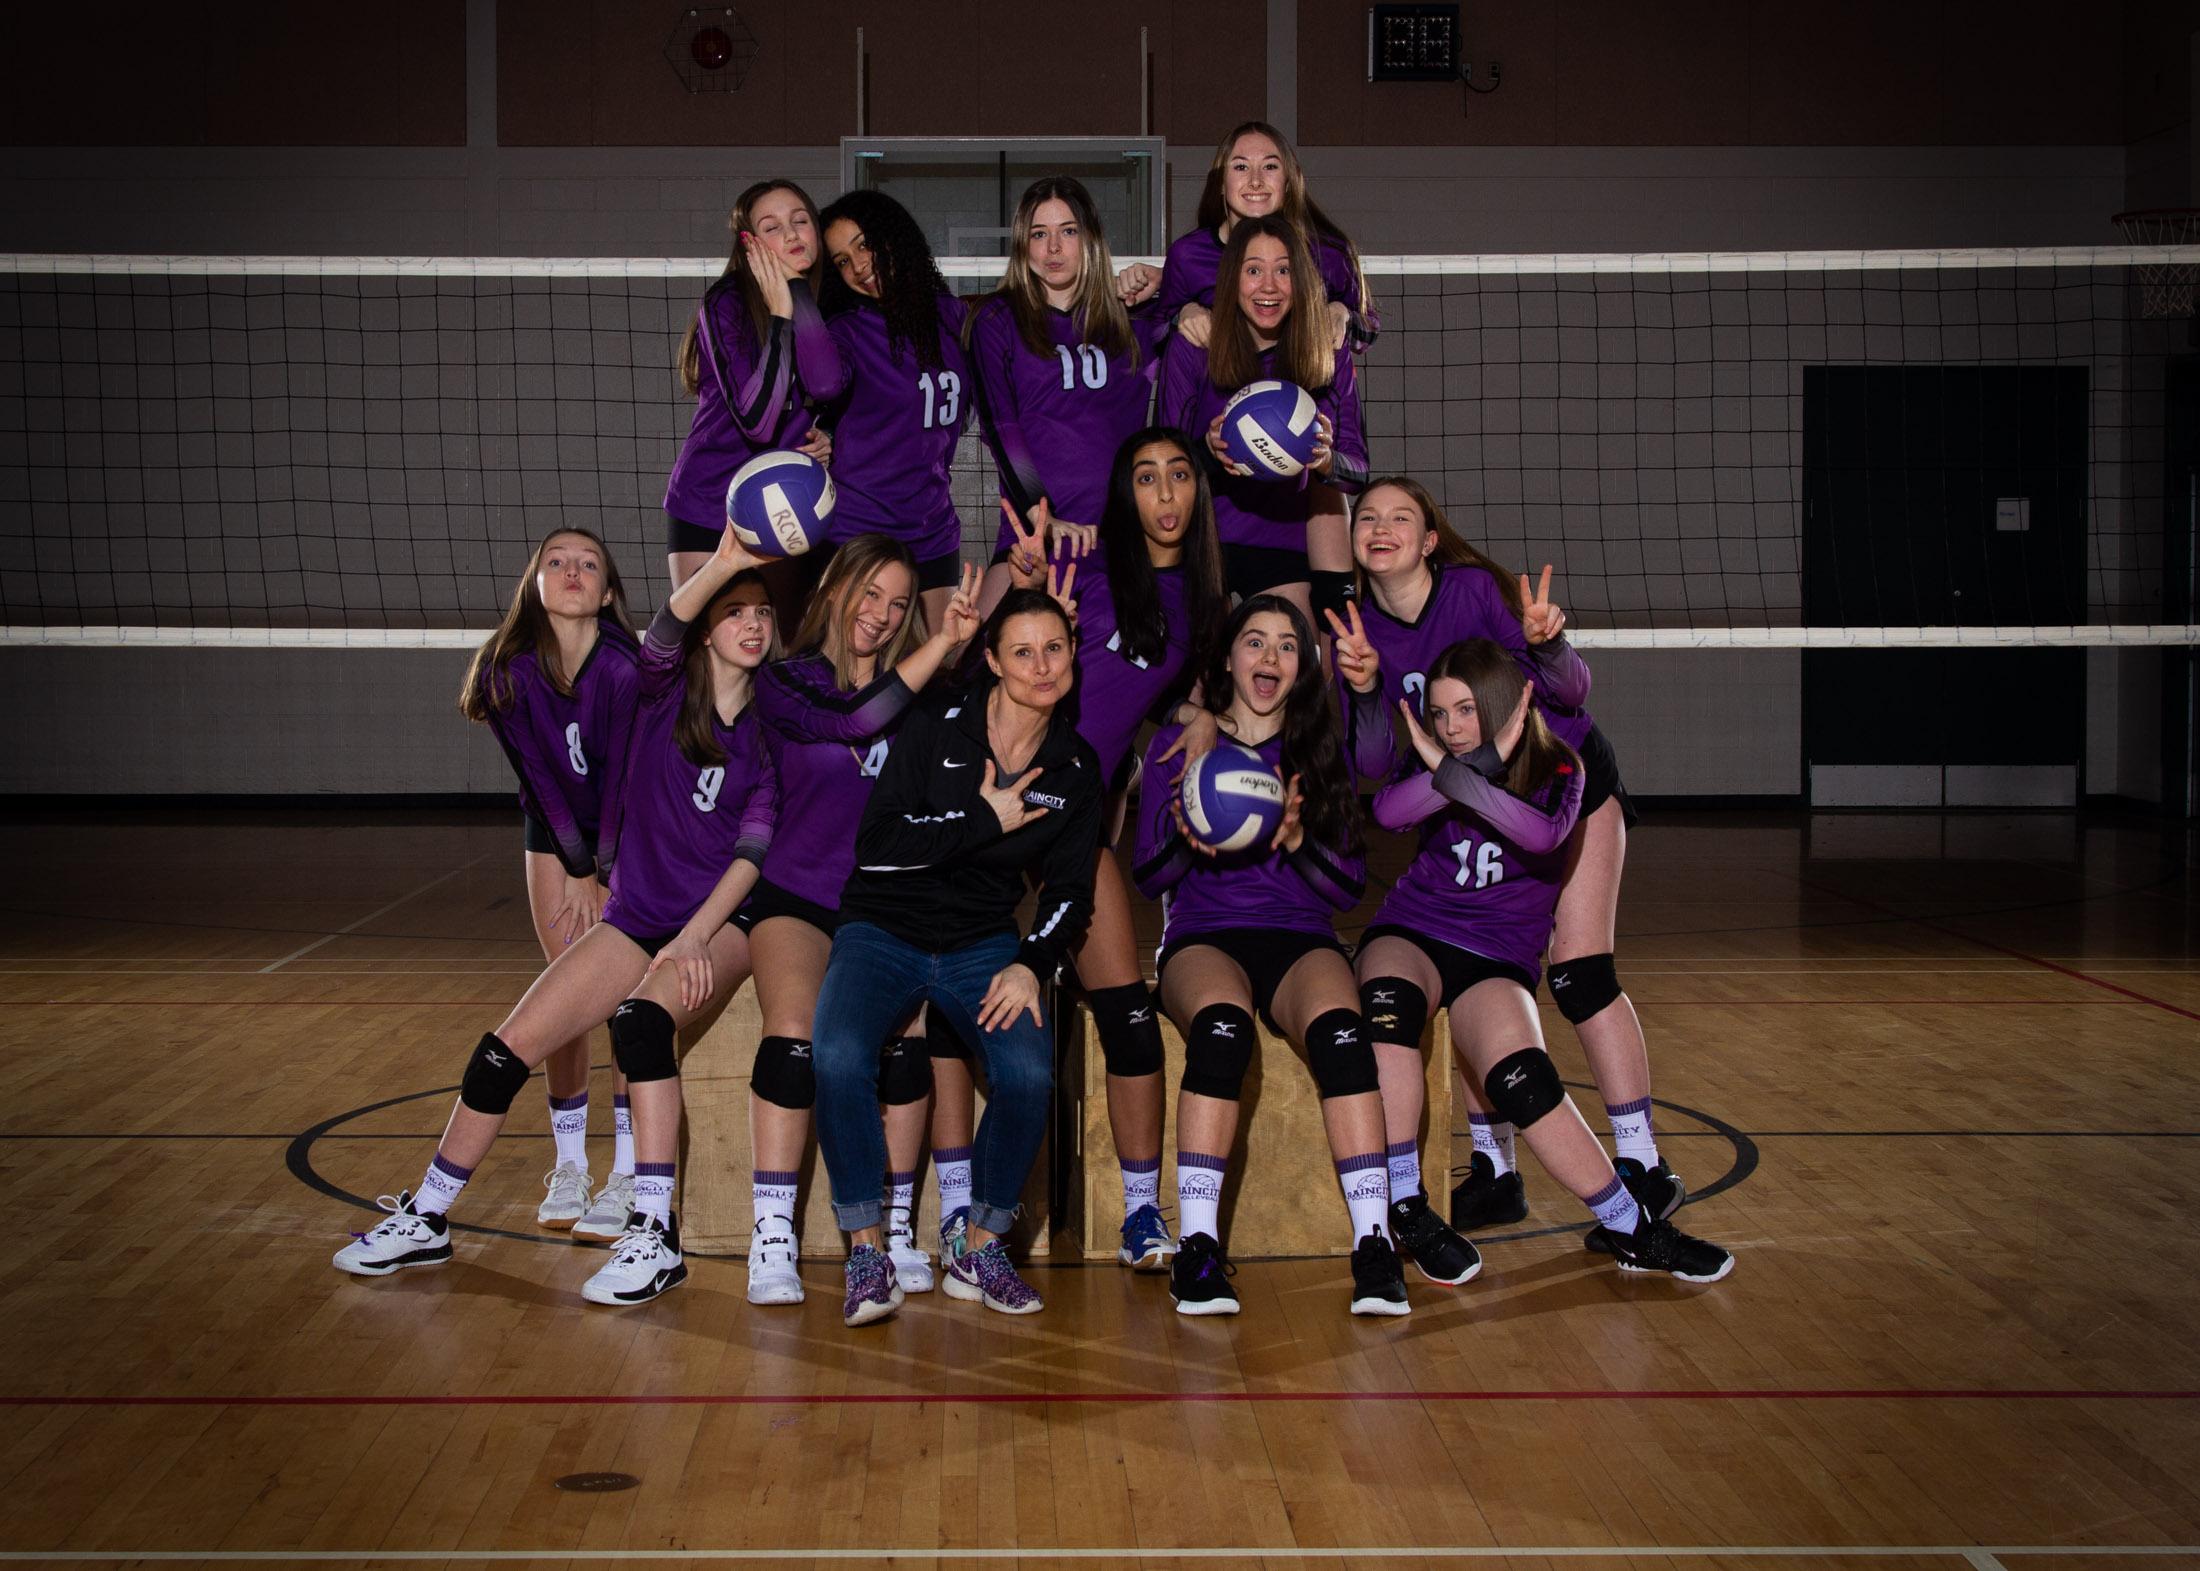 Raincity Volleyball Club